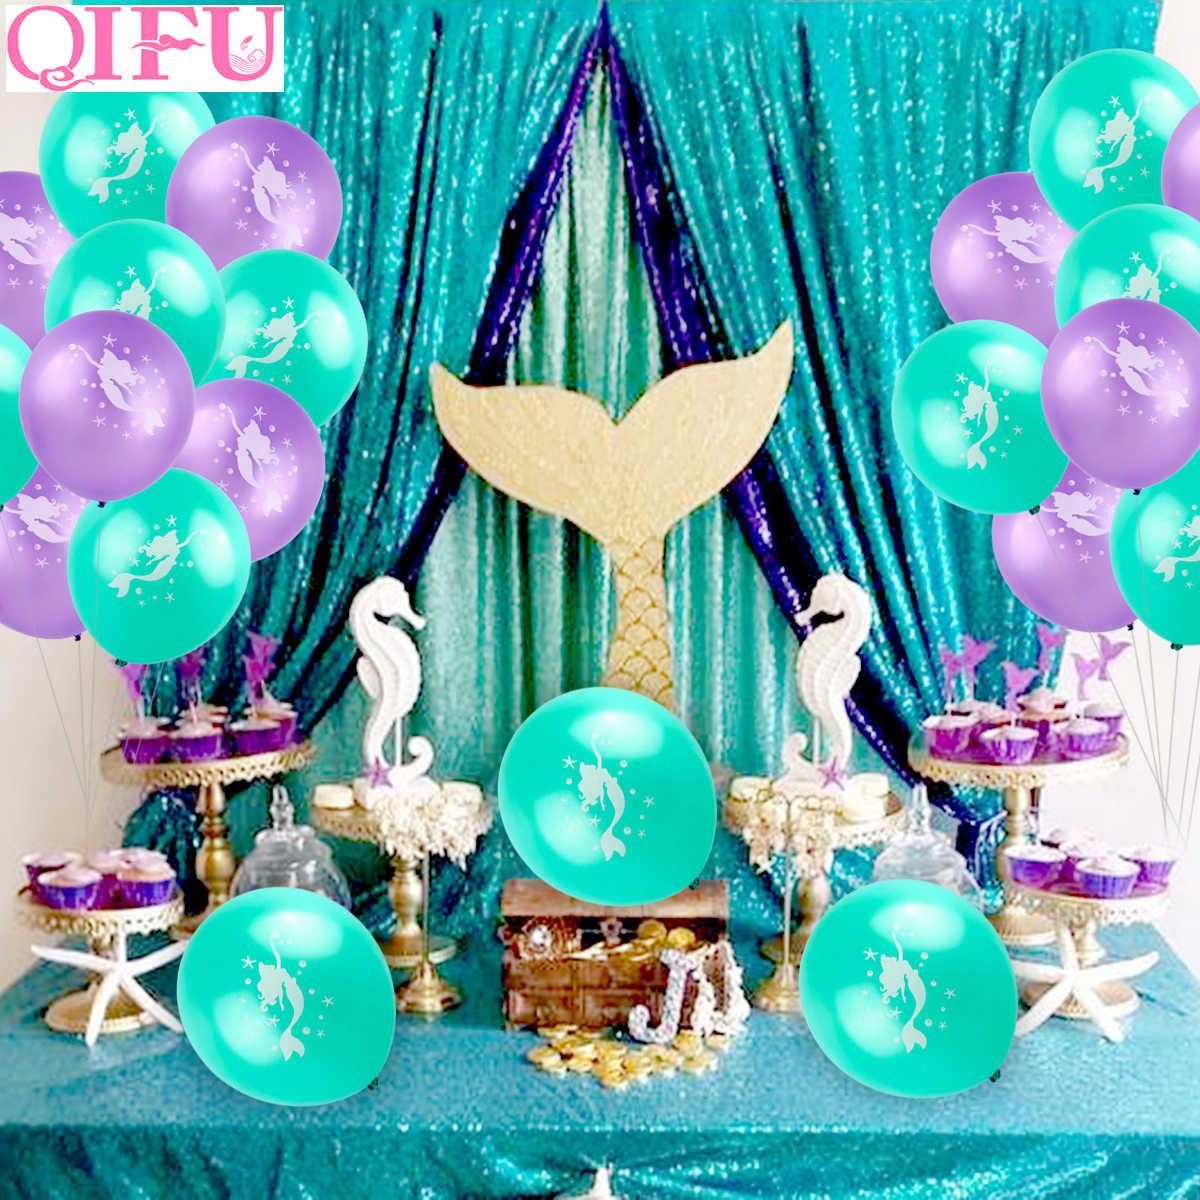 Qifu Pequeña Sirena Globo Globos De Fiesta Cumpleaños Fiesta